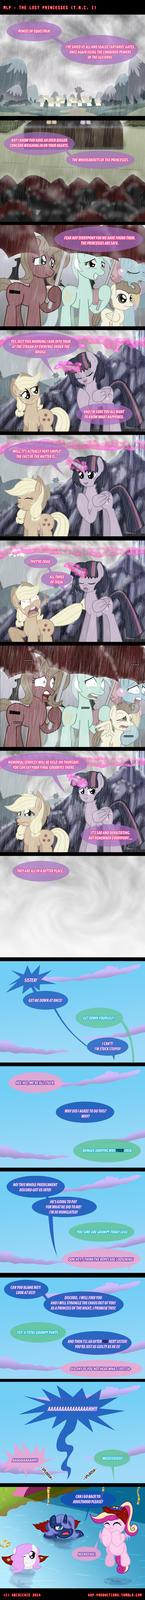 The Lost Princesses